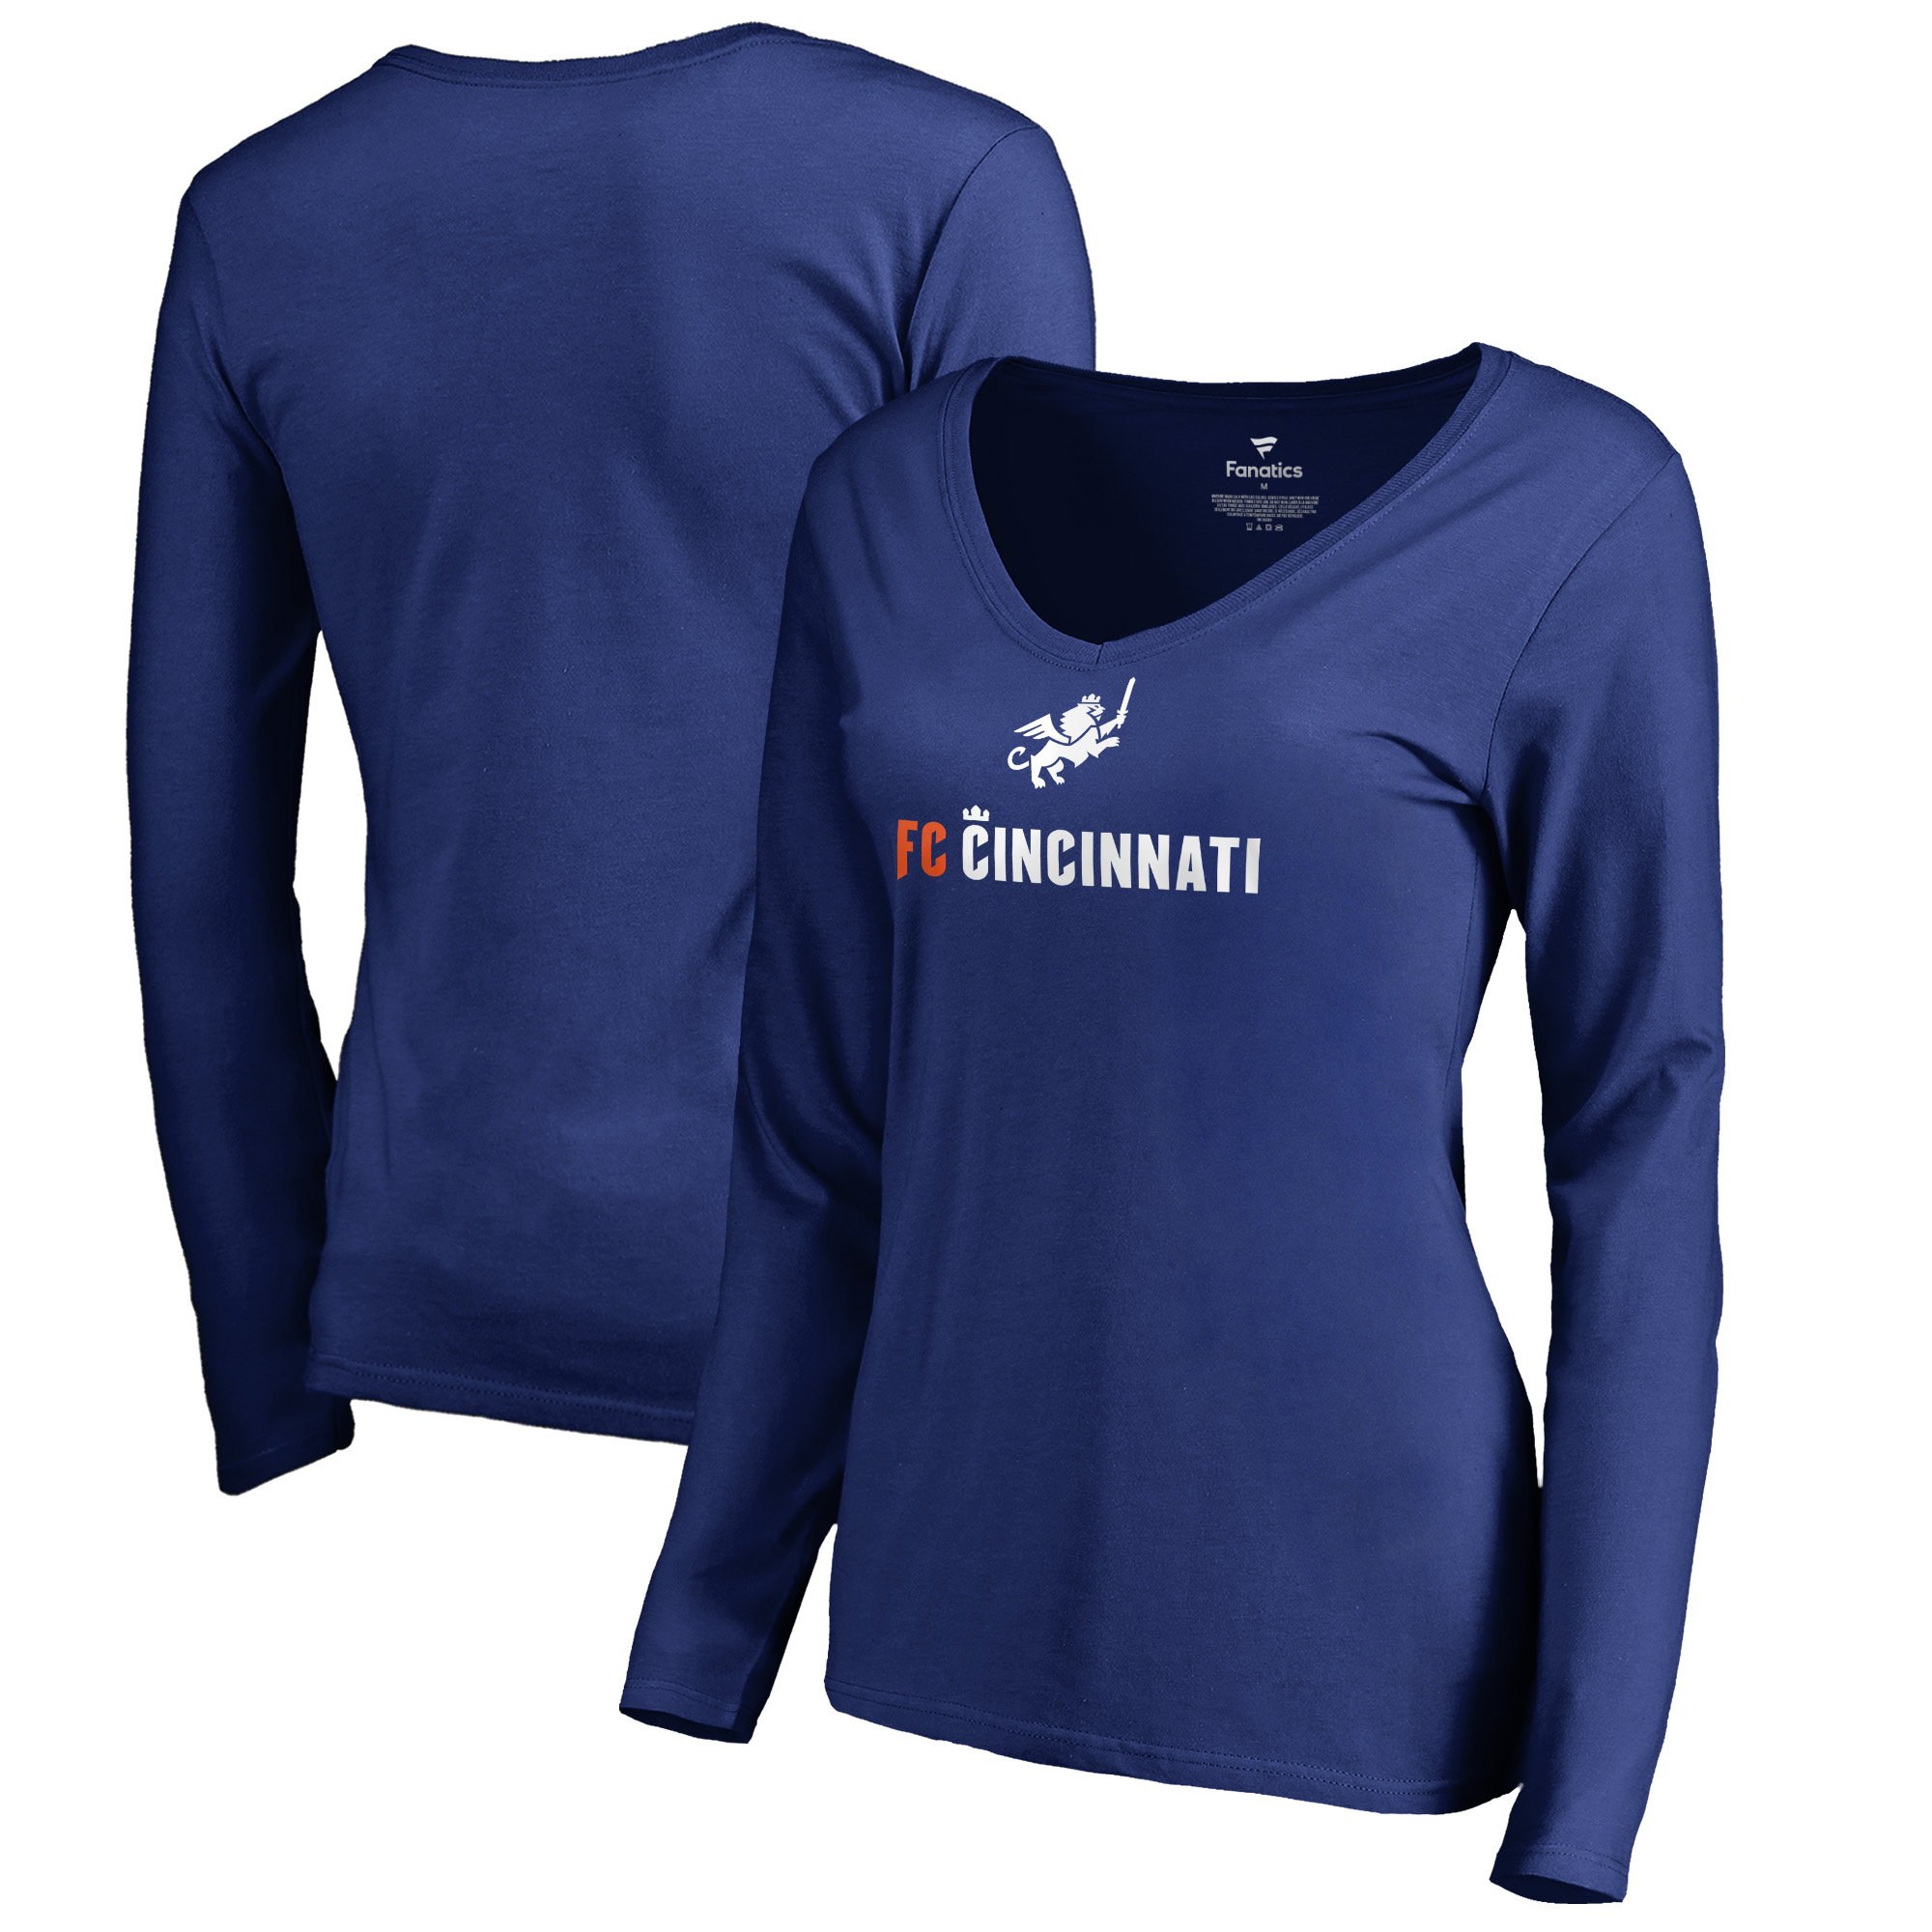 FC Cincinnati Fanatics Branded Women's Victory Arch Long Sleeve V-Neck T-Shirt - Royal